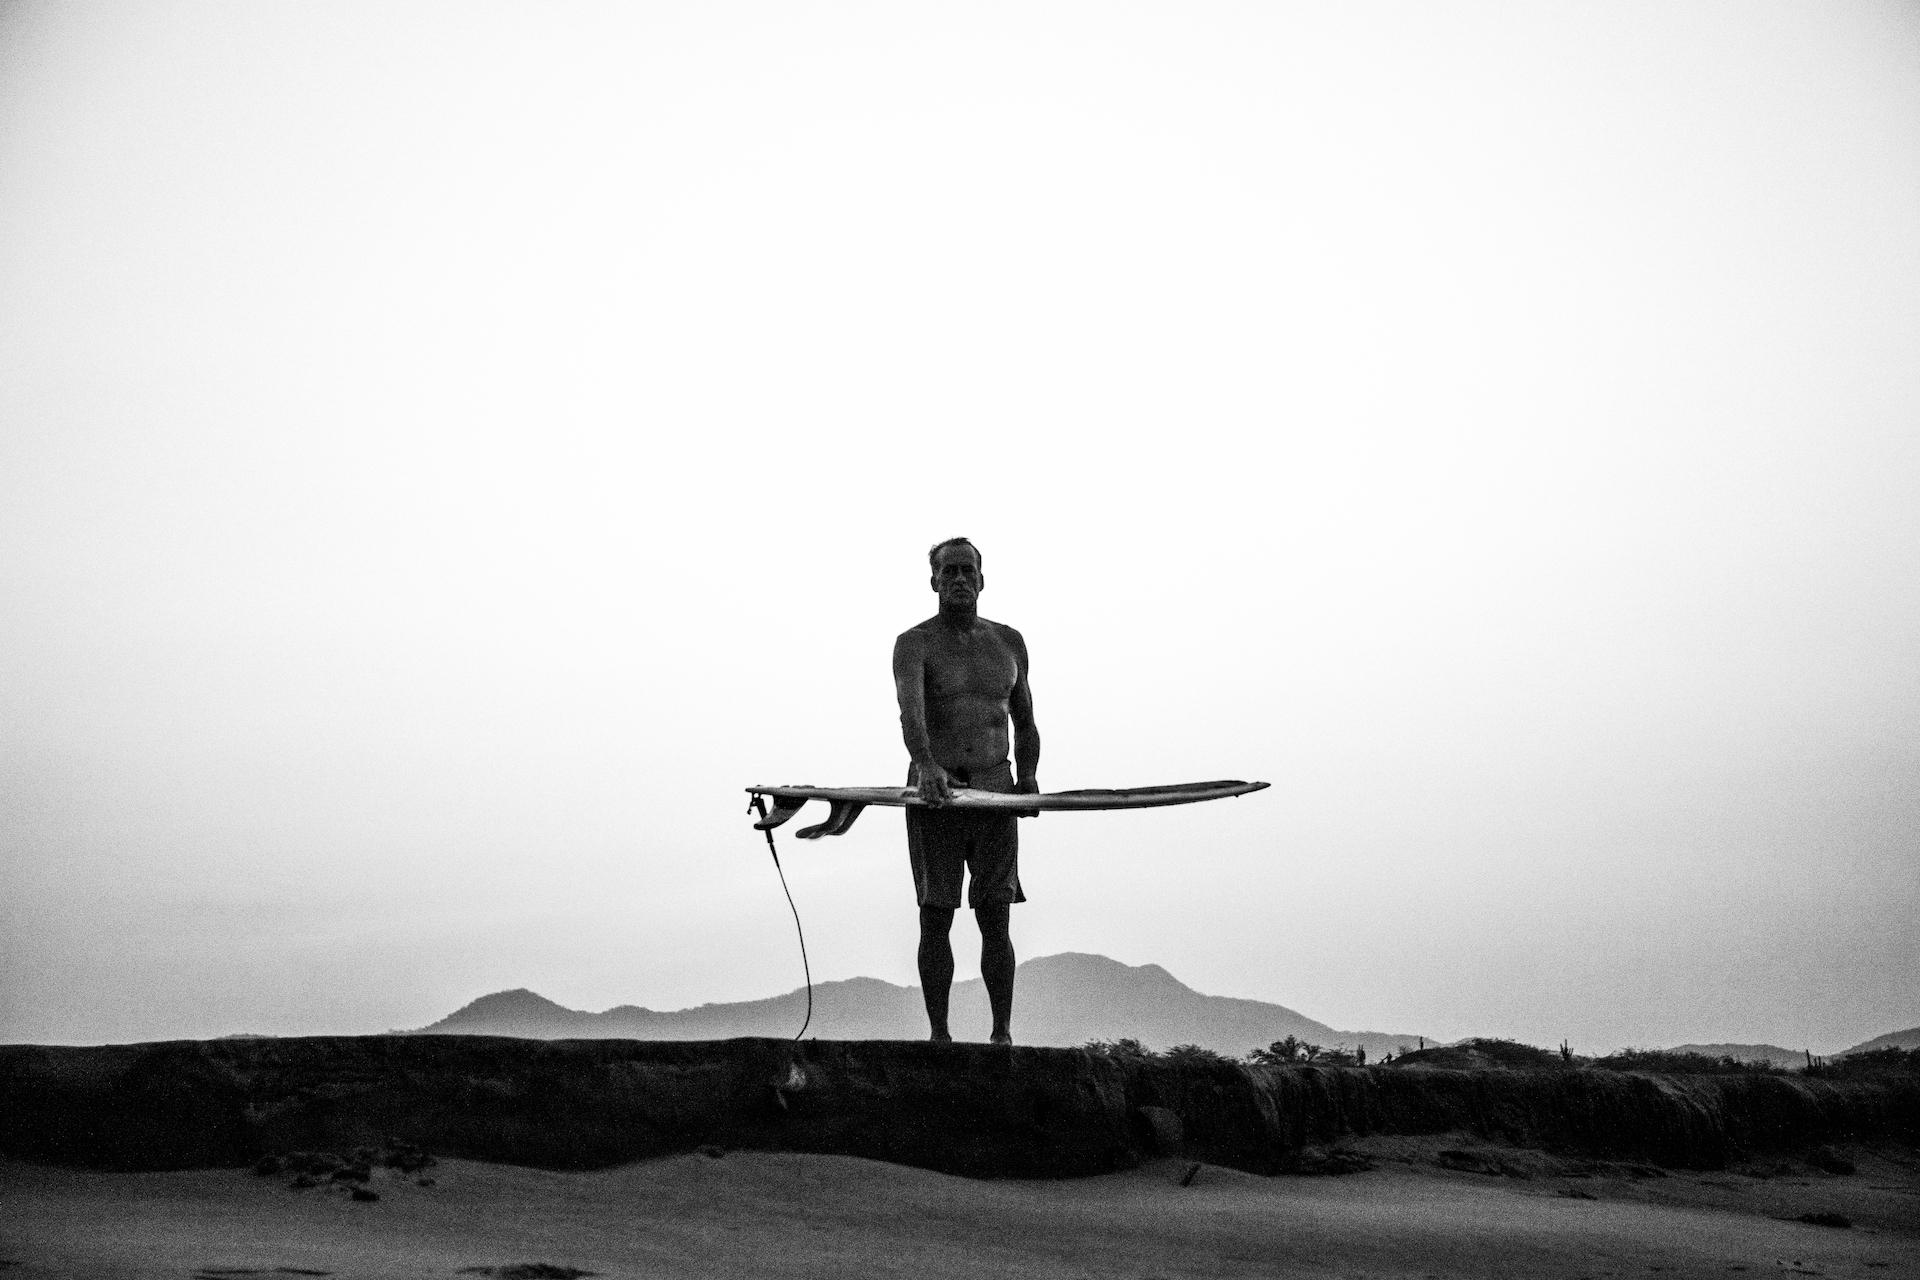 www.surfline.com